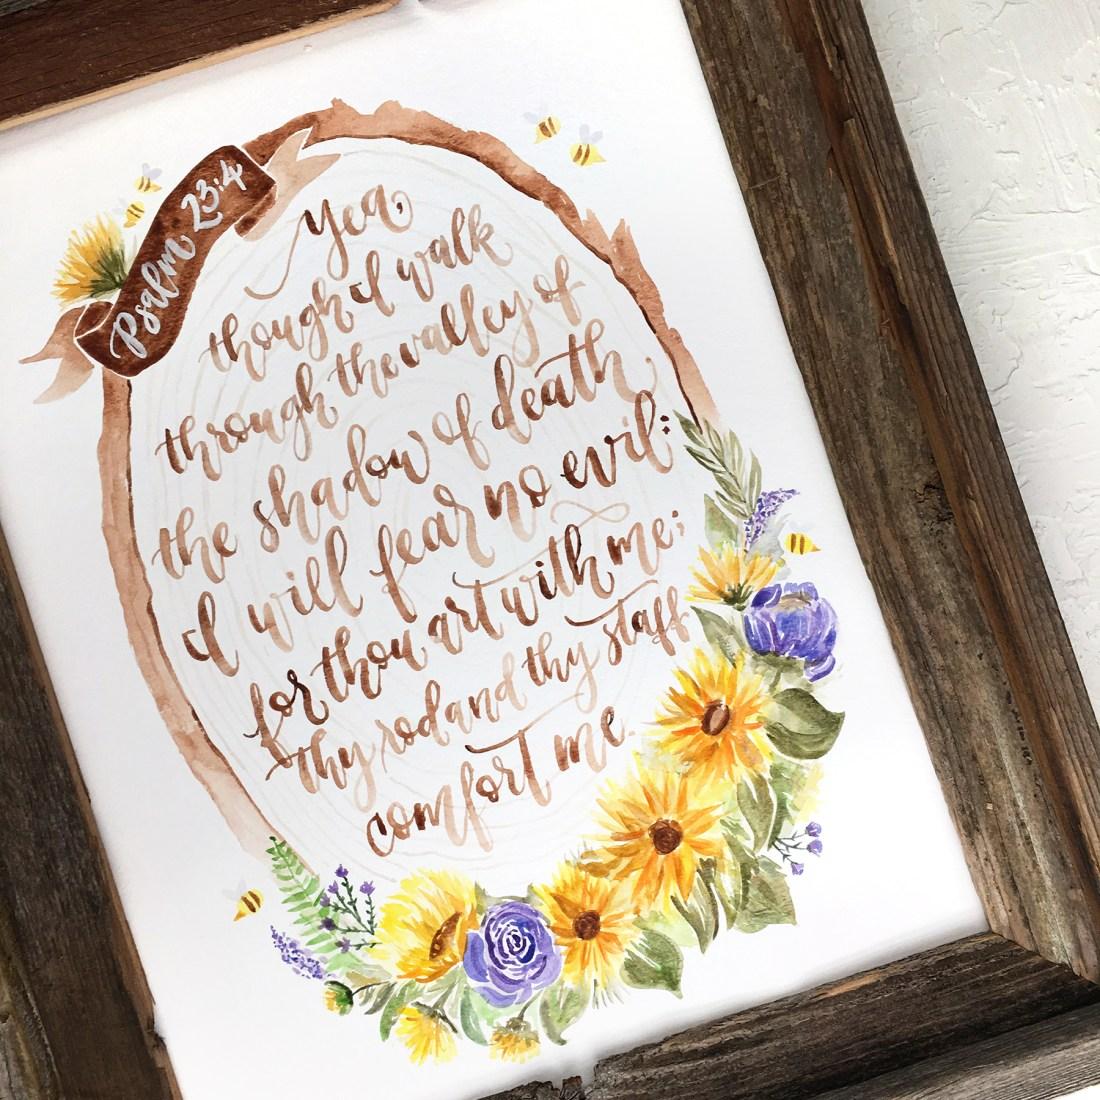 Sam Allen Creates - Psalm 23 Sunflower Watercolor Painting